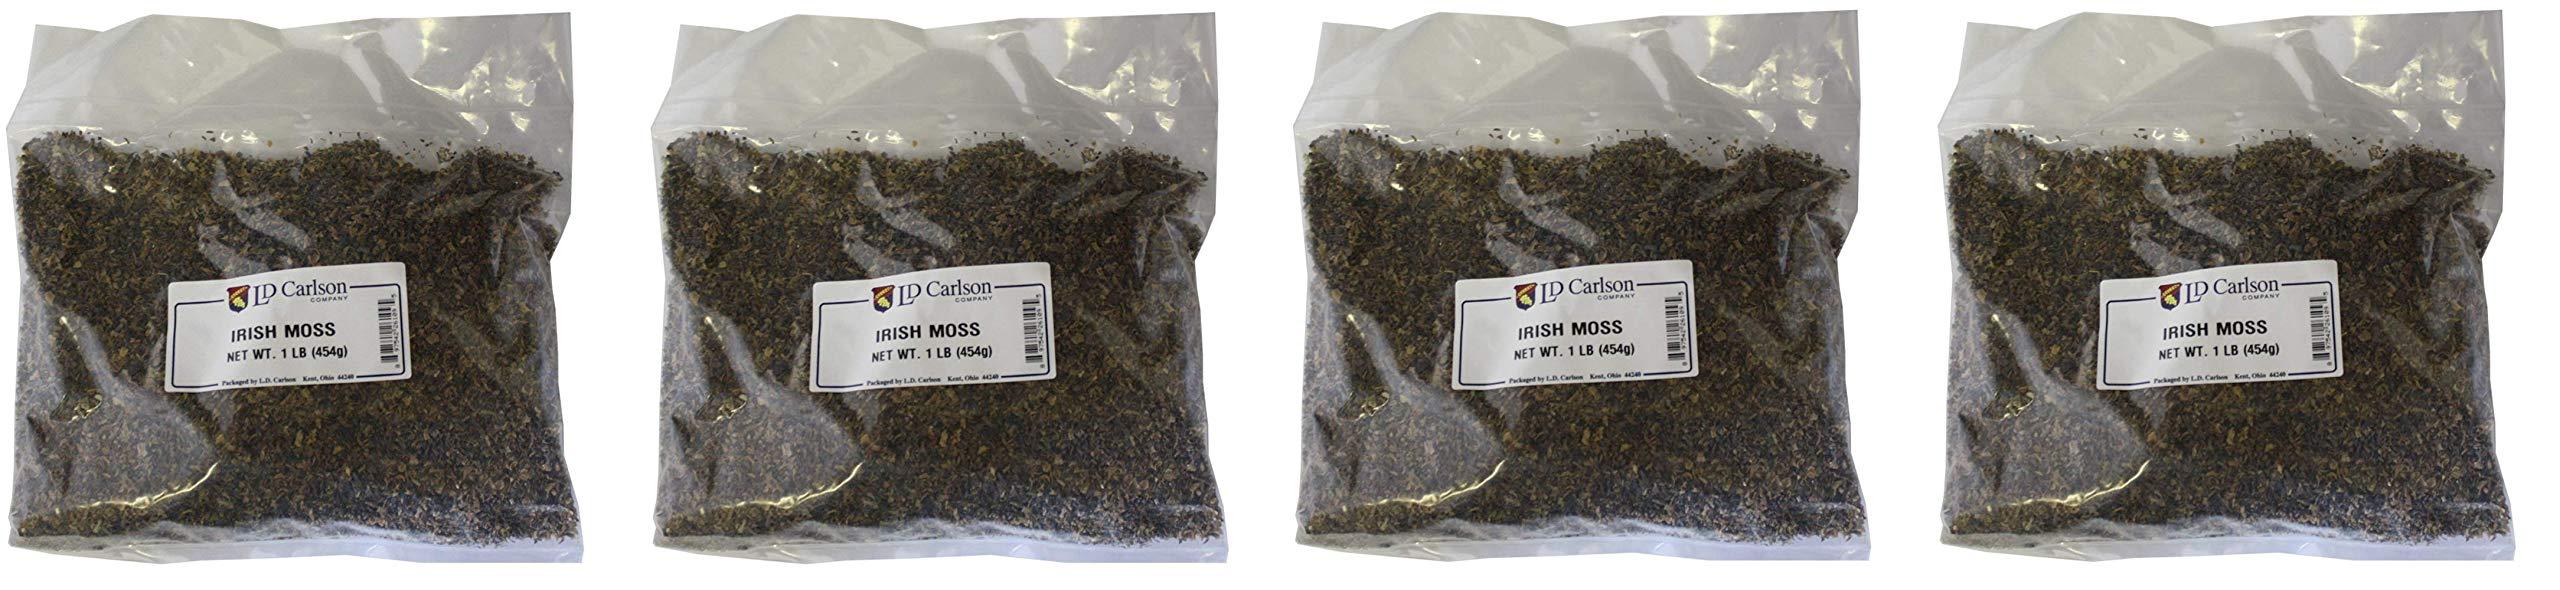 Irish Moss Flakes, 1 lb. (4-Pack)